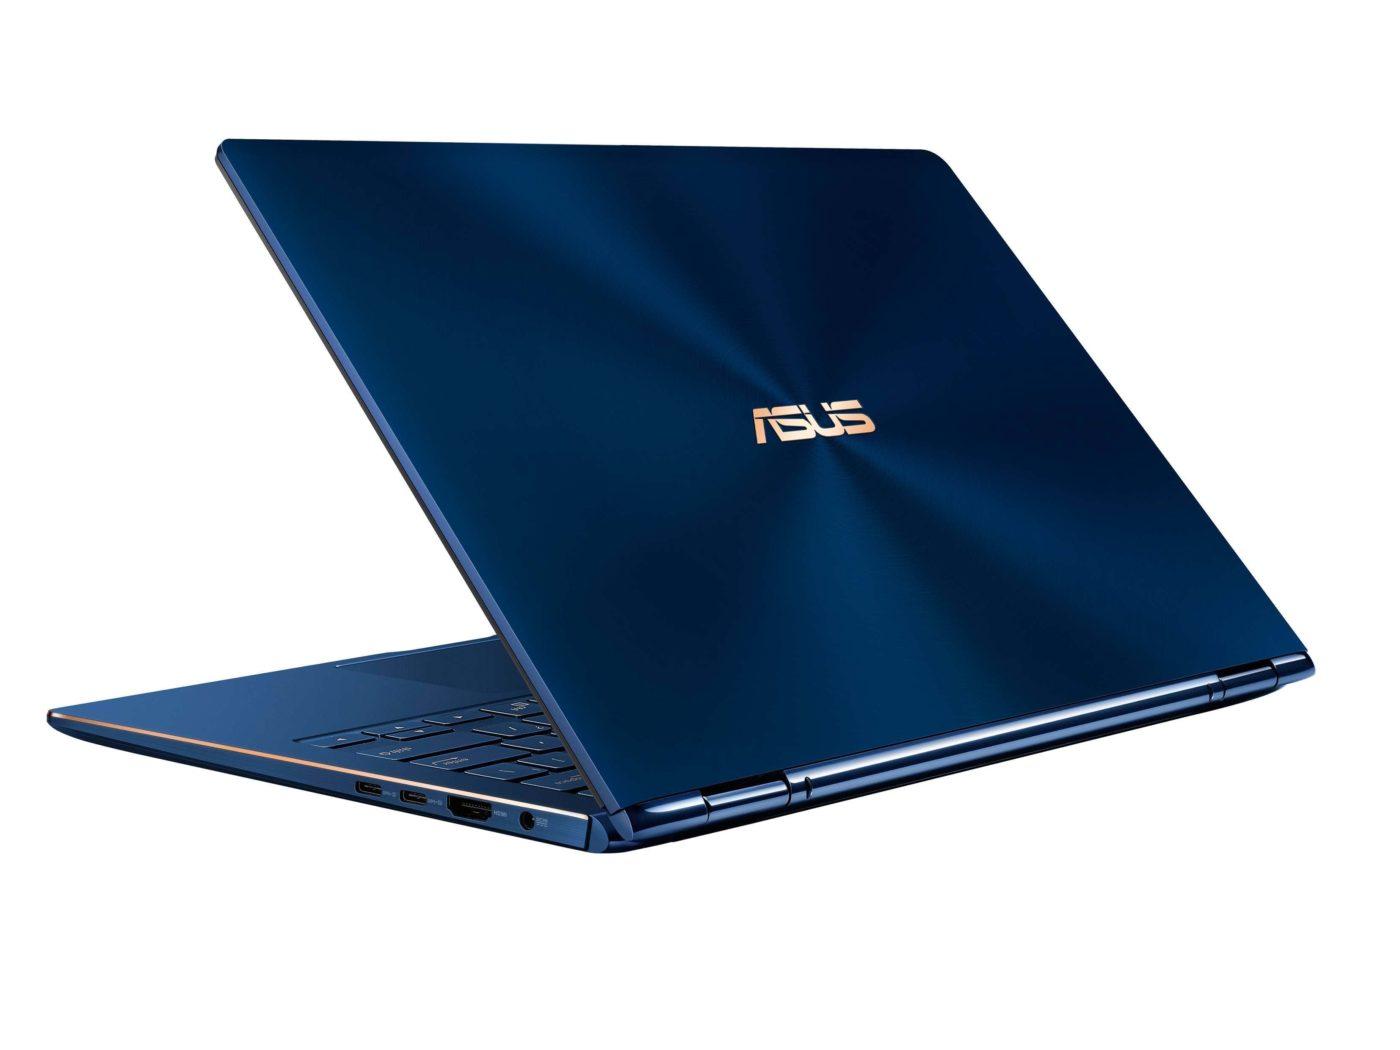 Asus Introduces The Zenbook Flip 13/15 - Sports Core i7-8565U, 16GB RAM & GTX 1050 4